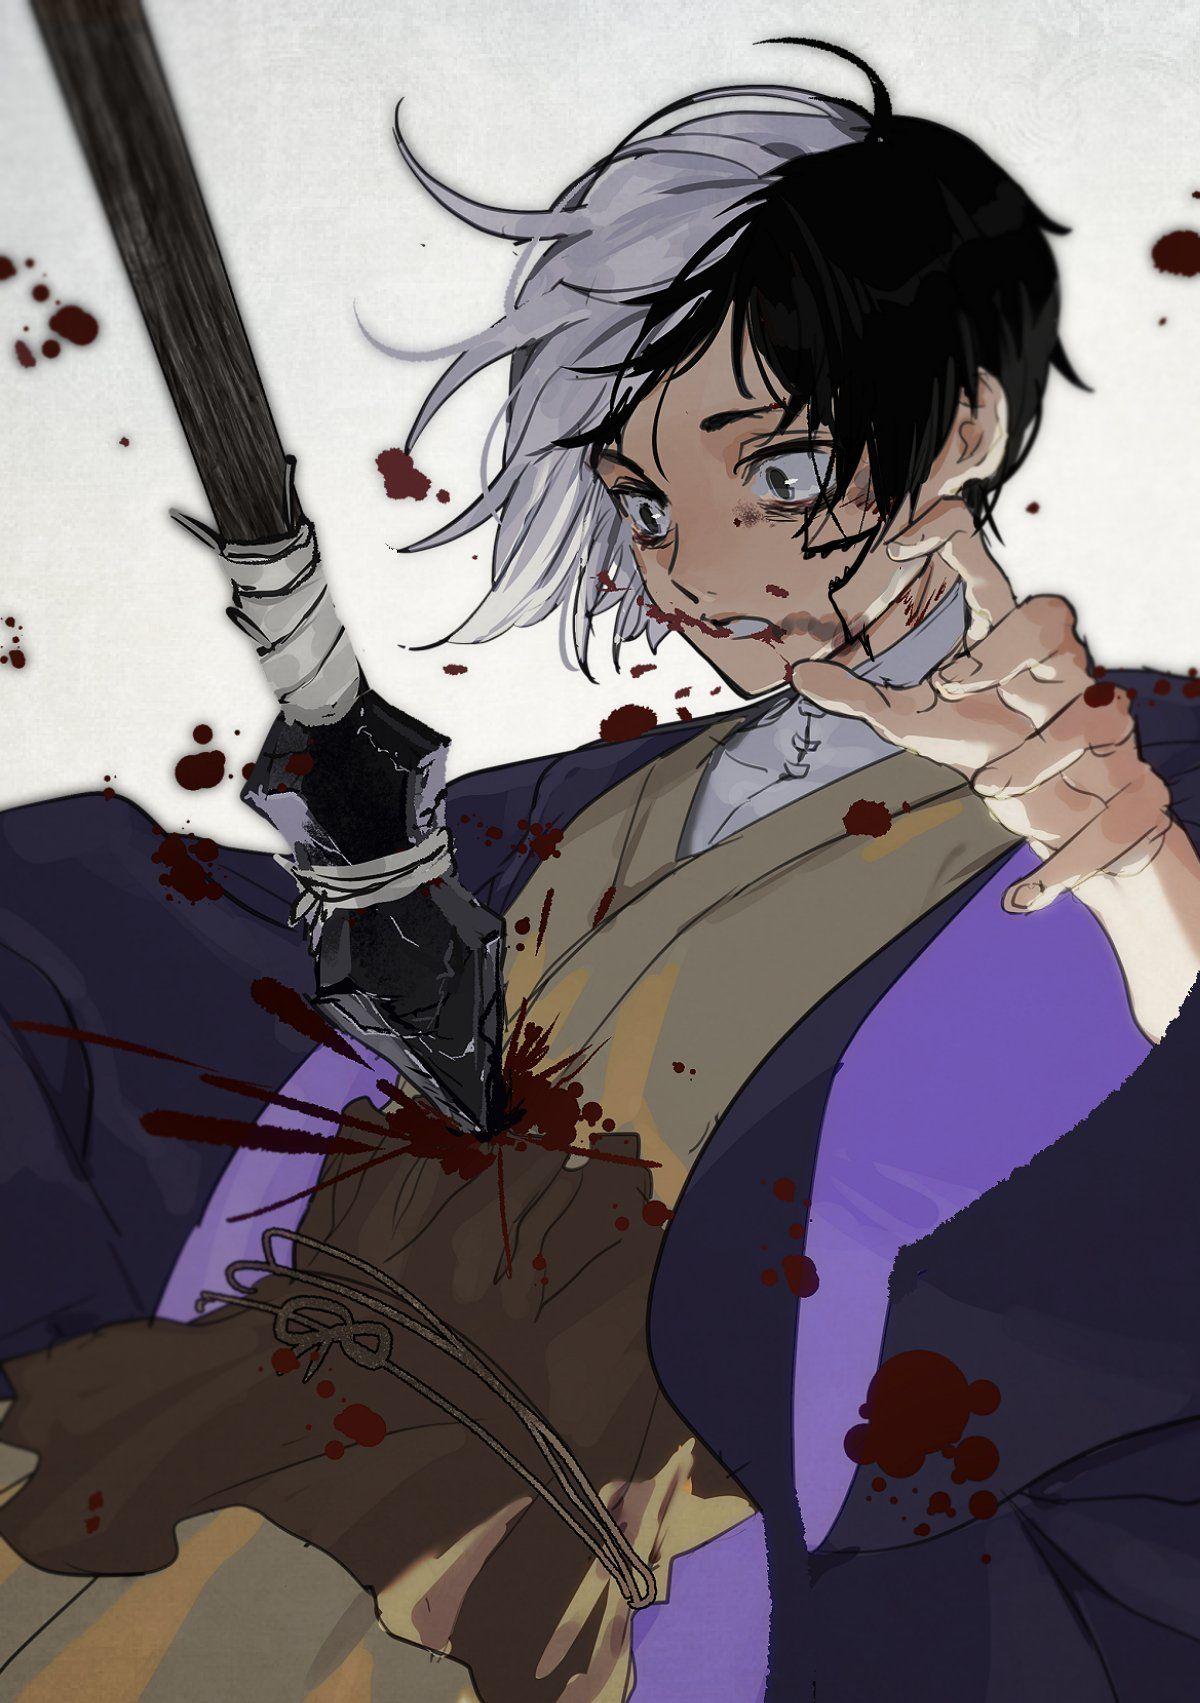 Pin by Killu 7 on Dr stone Stone, Stone world, Anime